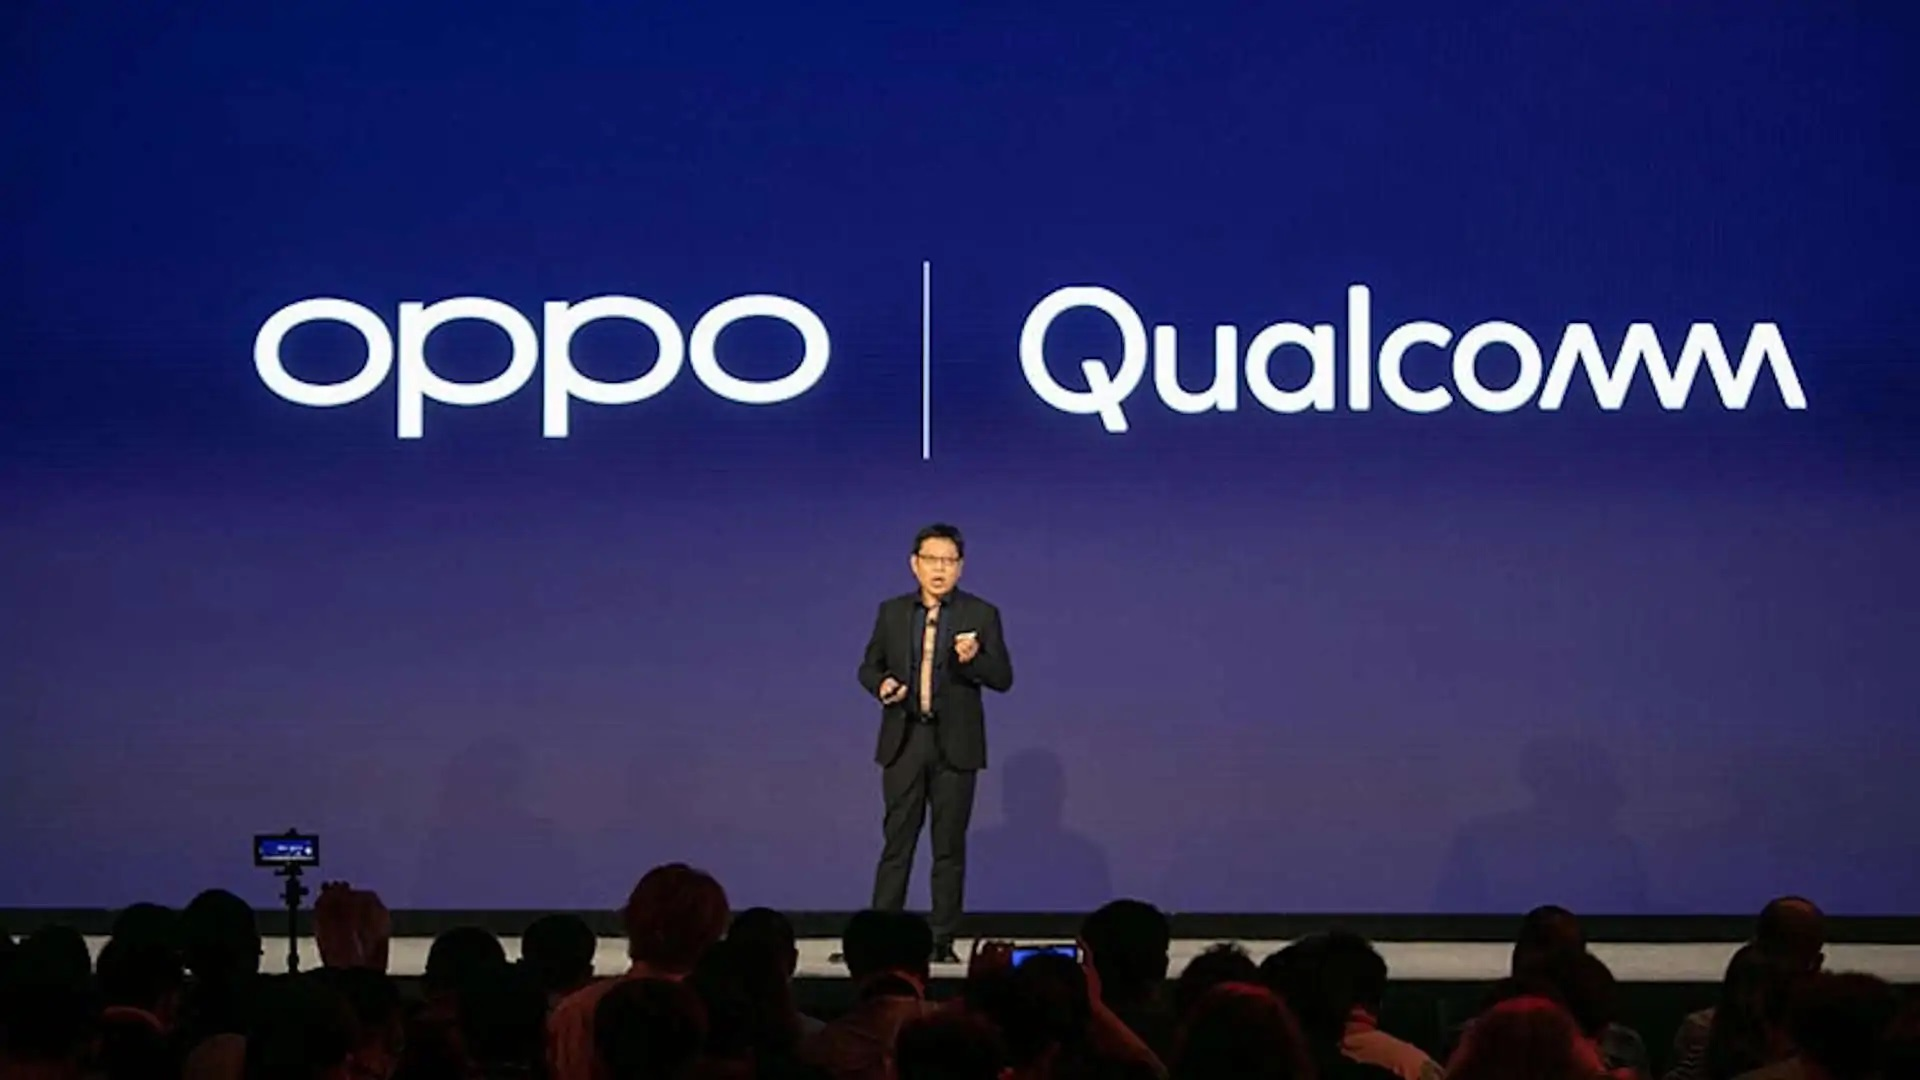 OPPO partenariat 5G avec Qualcomm